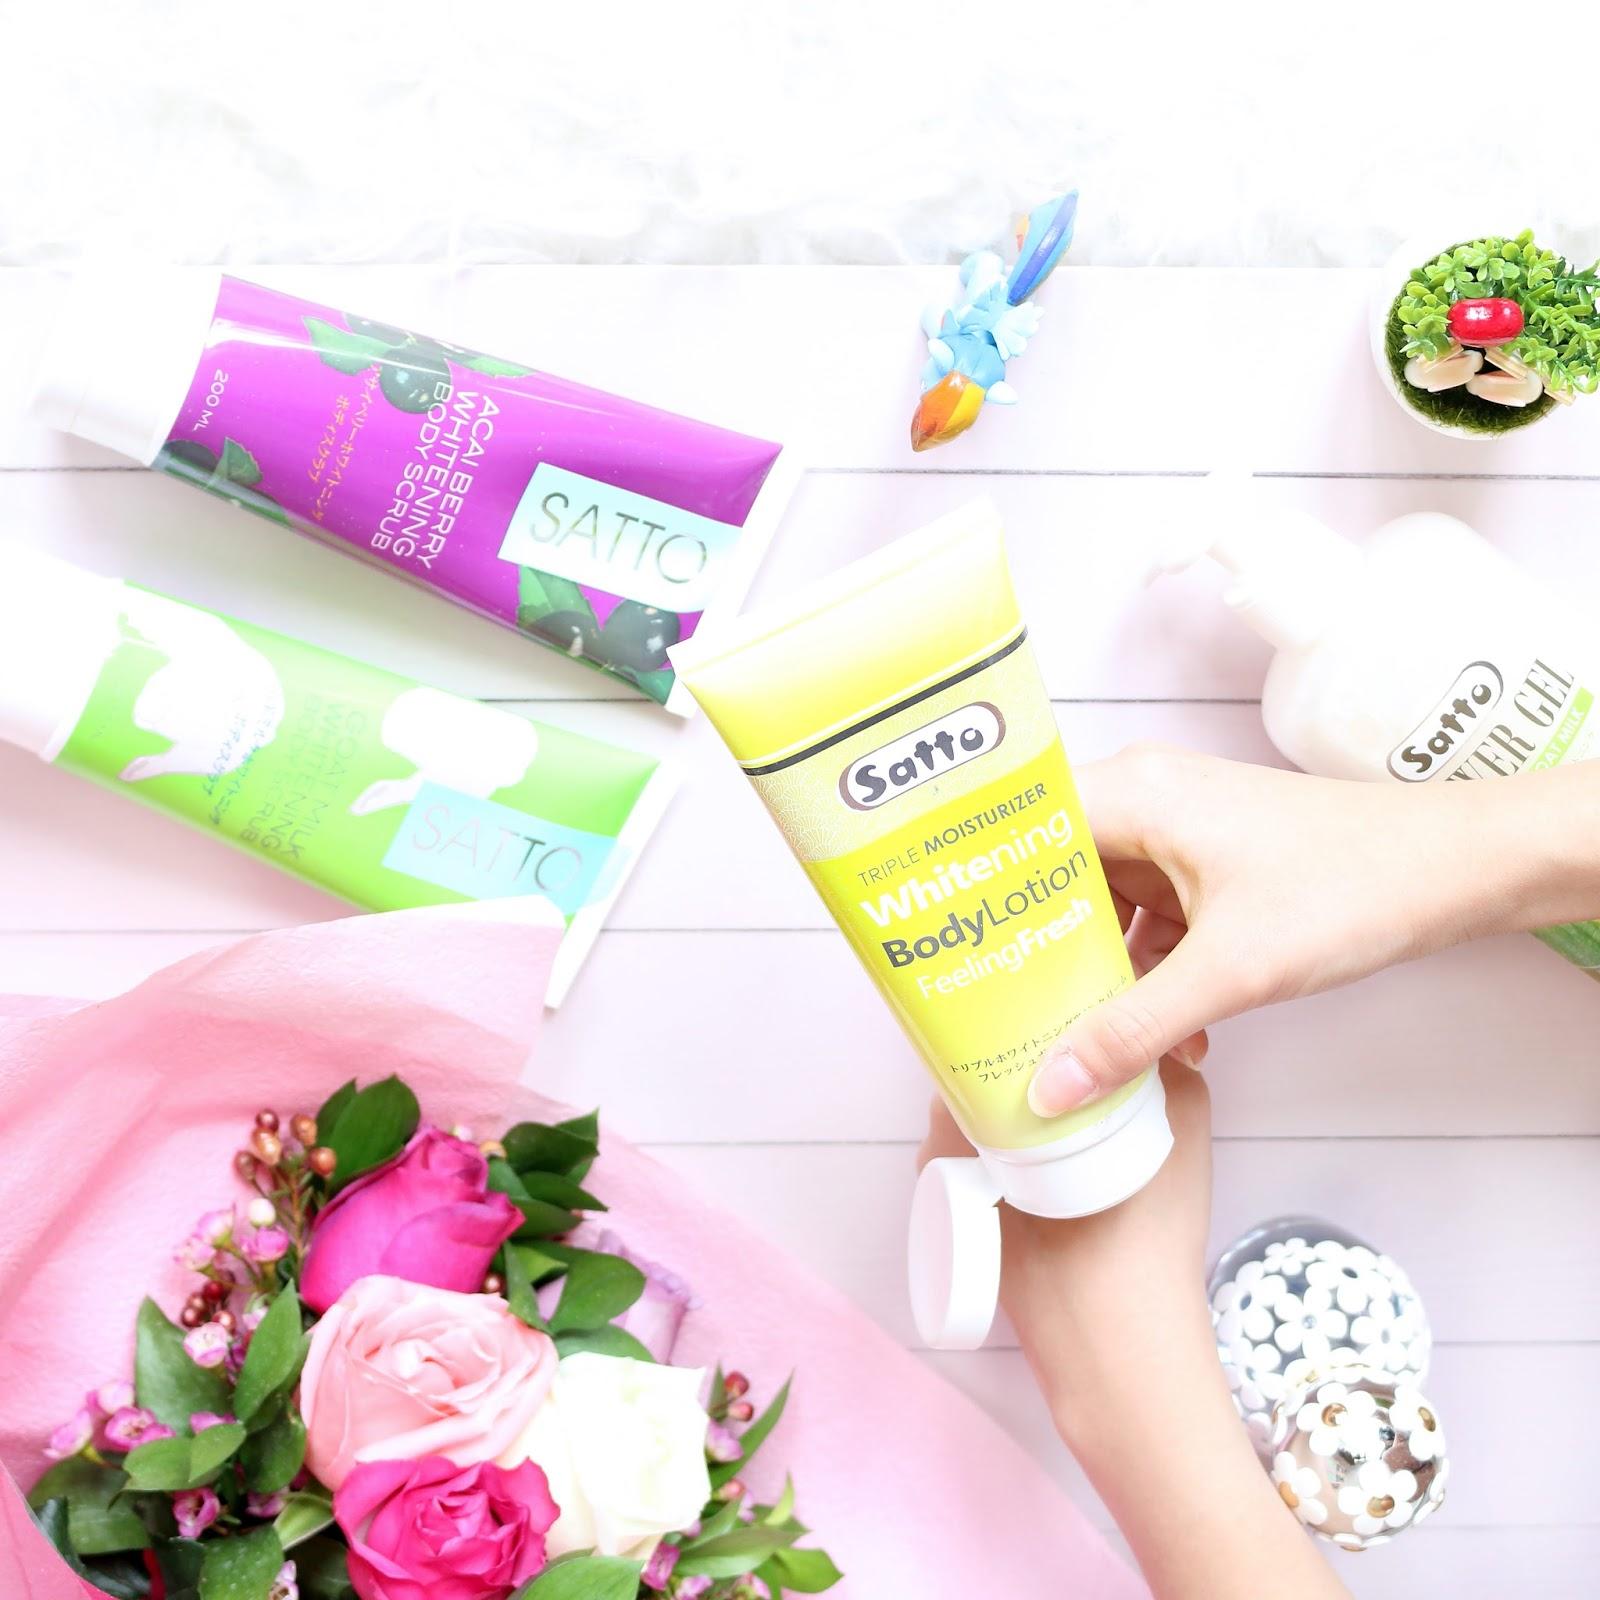 satto, satto body care, satto indonesia, whitening product, pemutih kulit alami, kulit putih, body care, satto